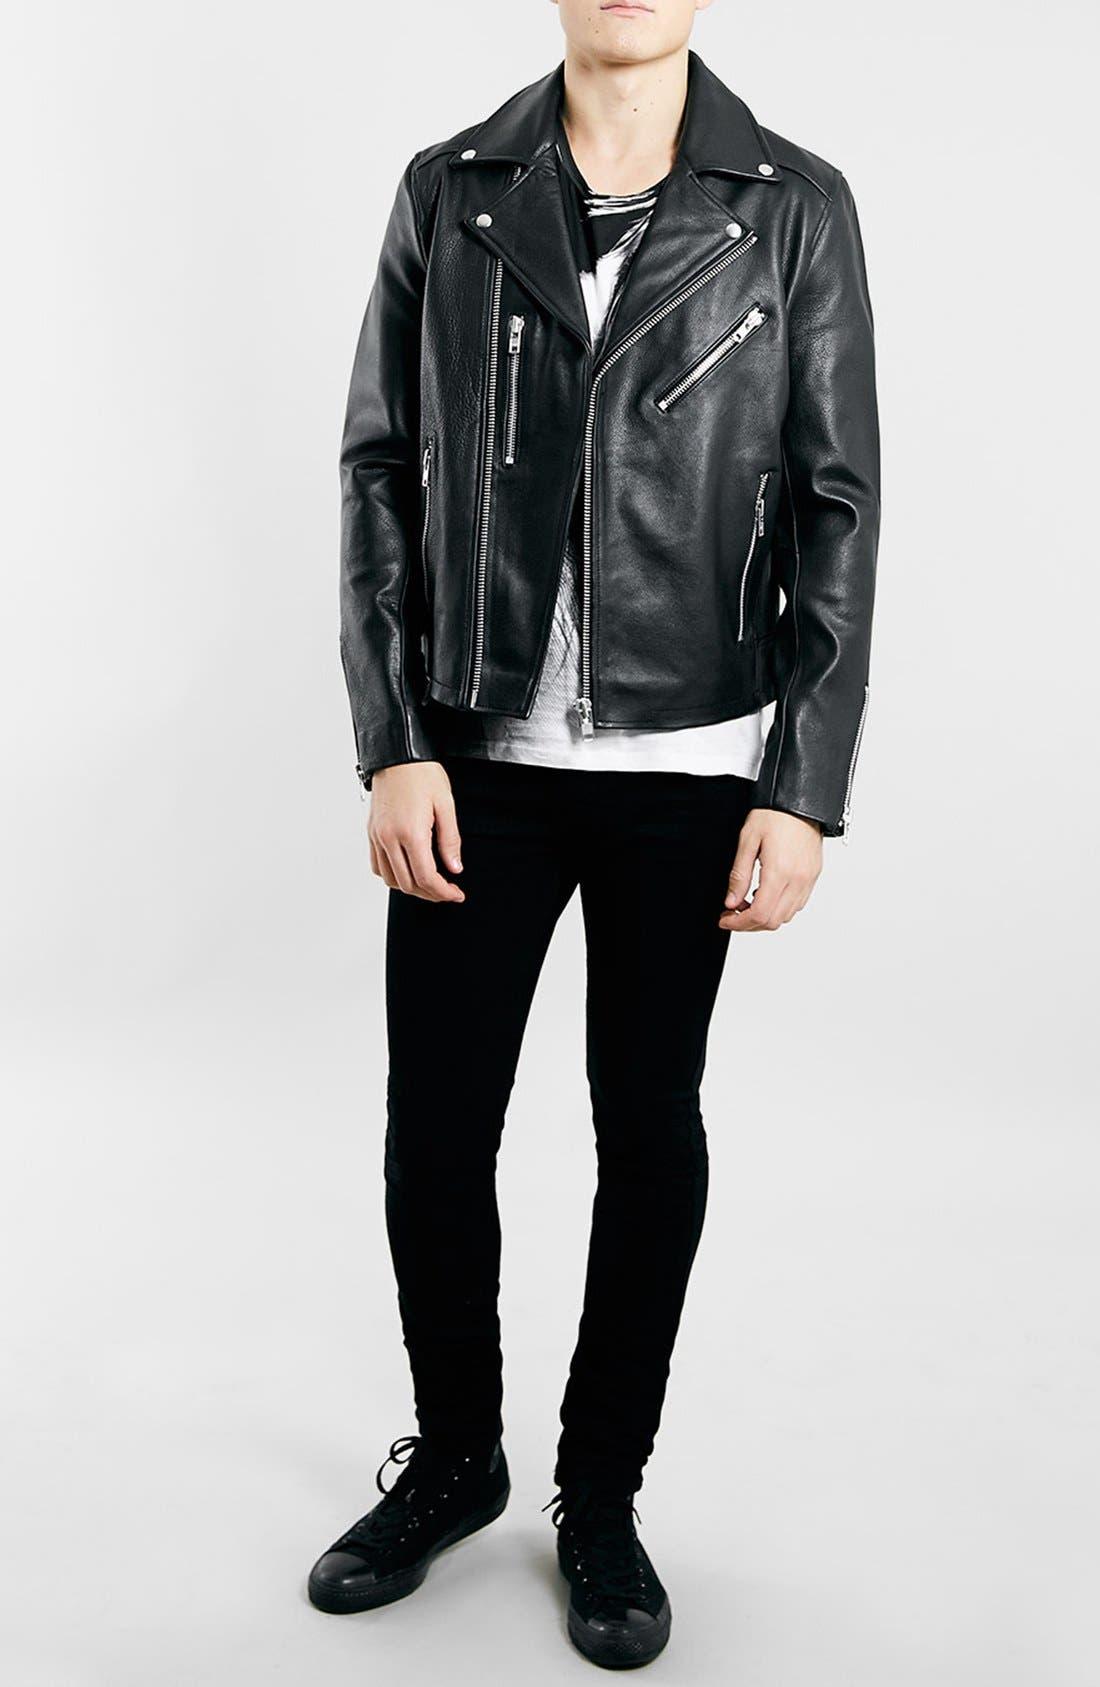 TOPMAN,                             Black Leather Biker Jacket,                             Alternate thumbnail 3, color,                             001